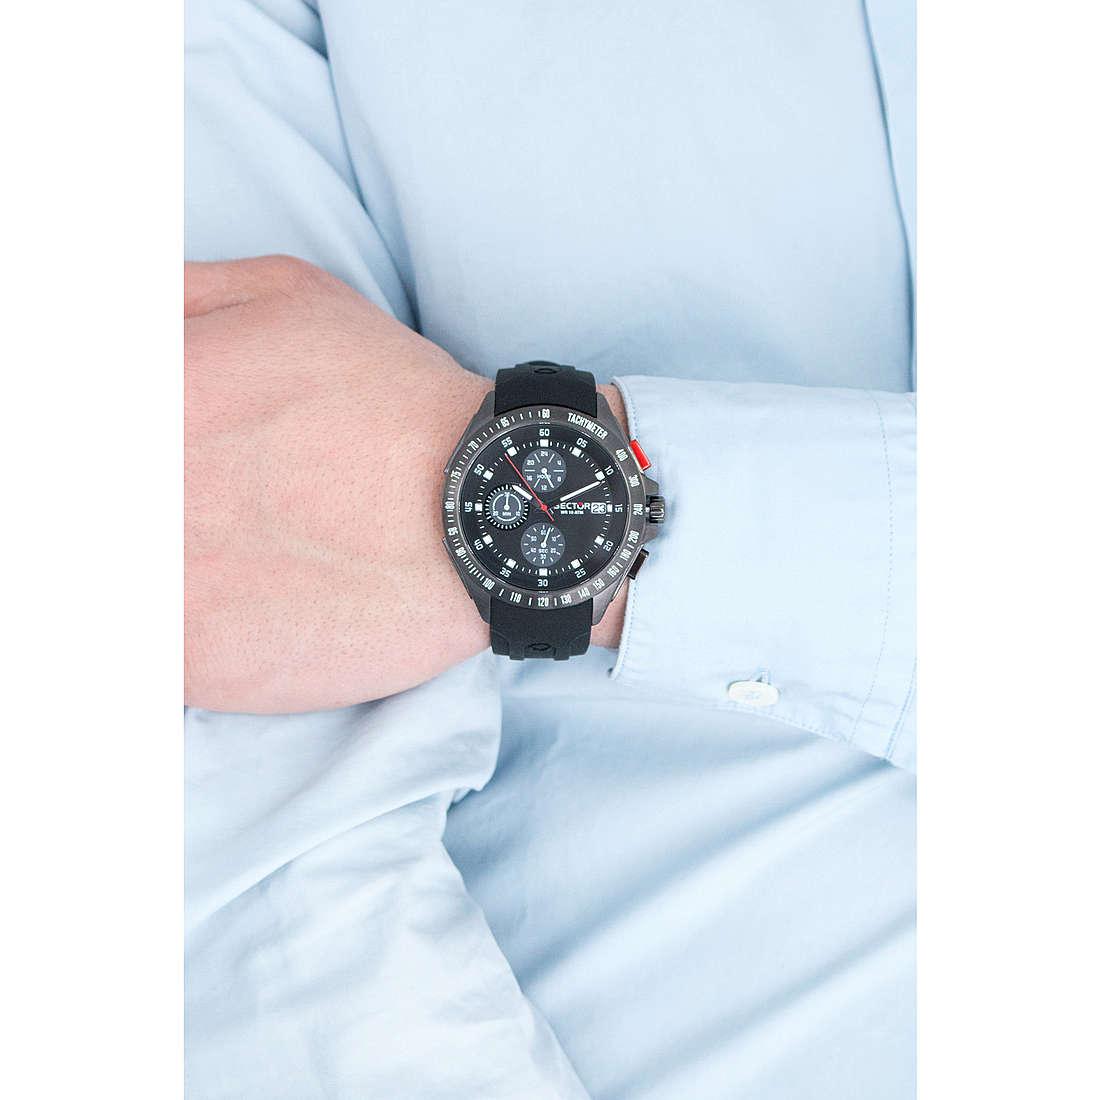 Sector cronografi uomo R3271687002 indosso